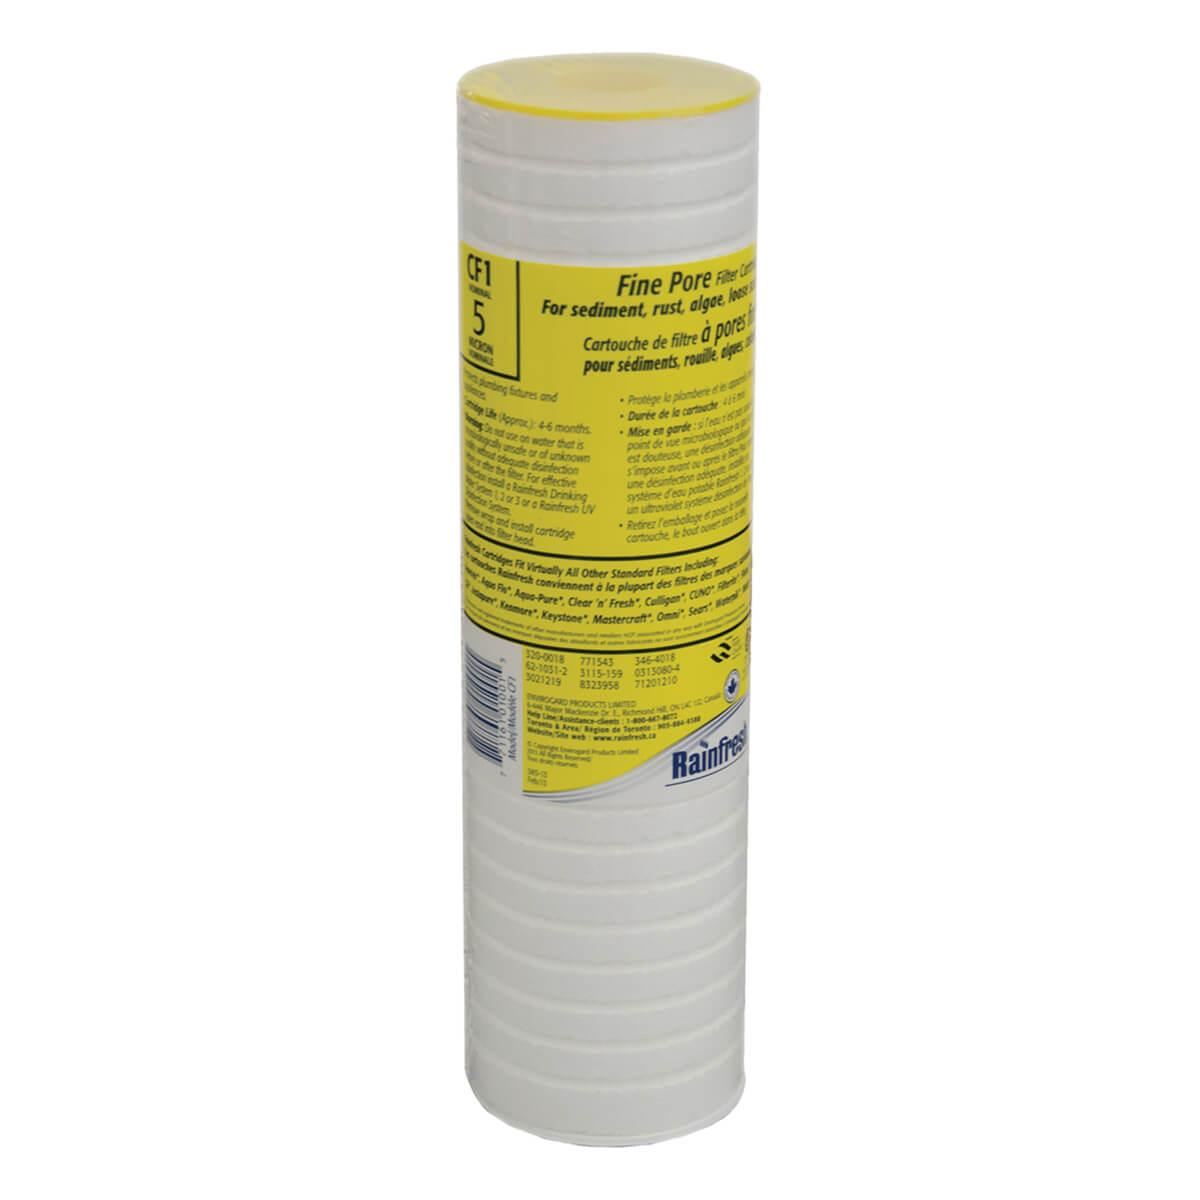 Rainfresh Fine Pore Sediment Filter Cartridge 5 Micron - CF1